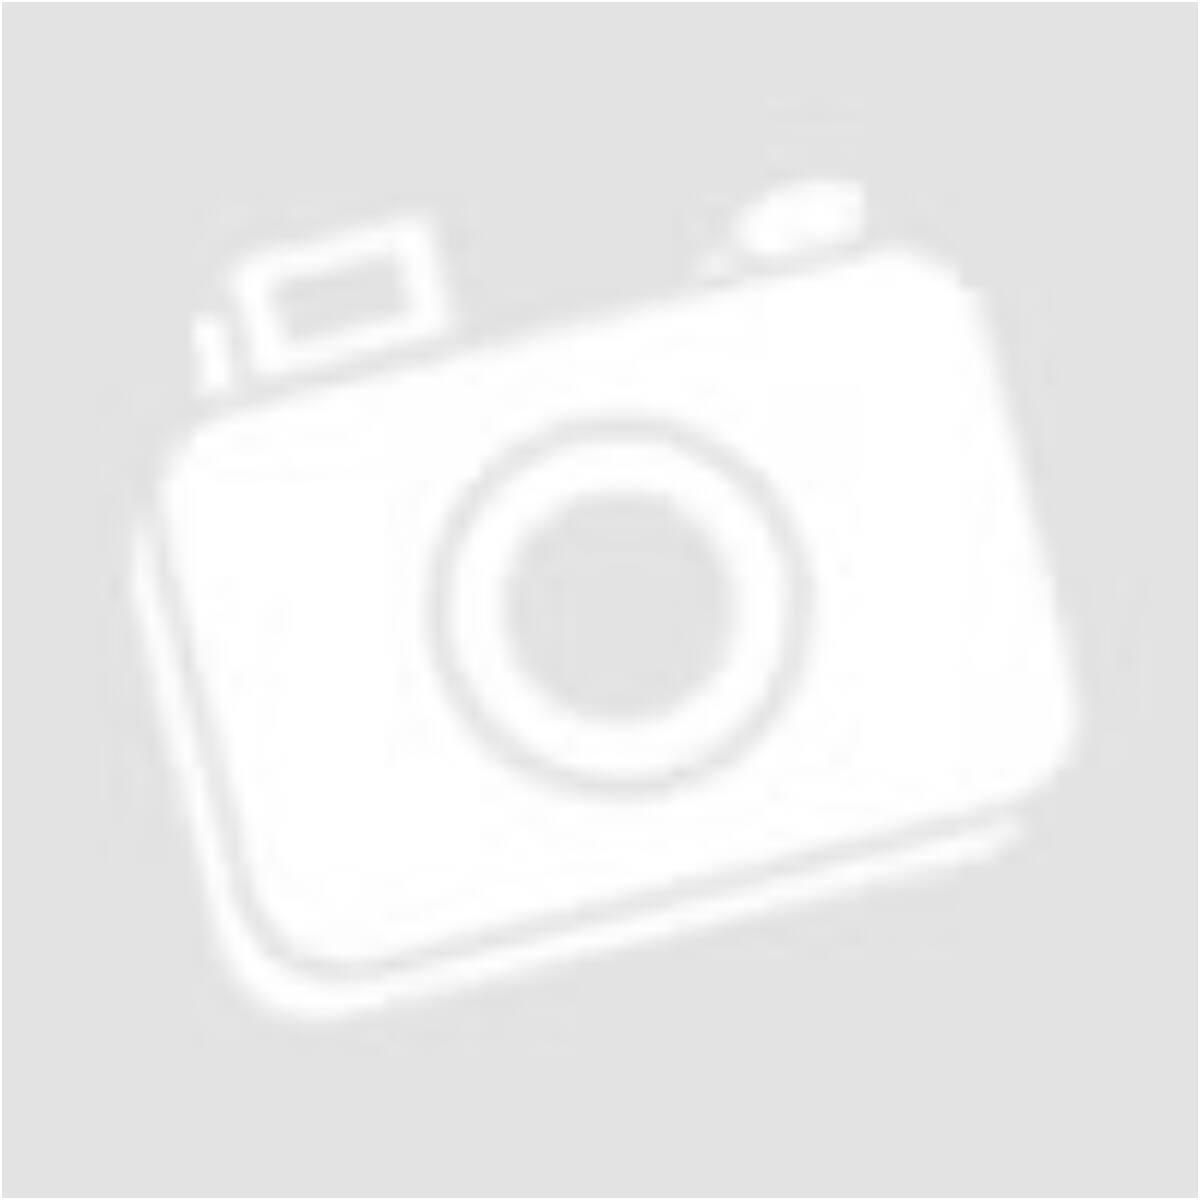 Férfi sportos télikabát  1826 - bordó - Télikabátok c64b22c5da